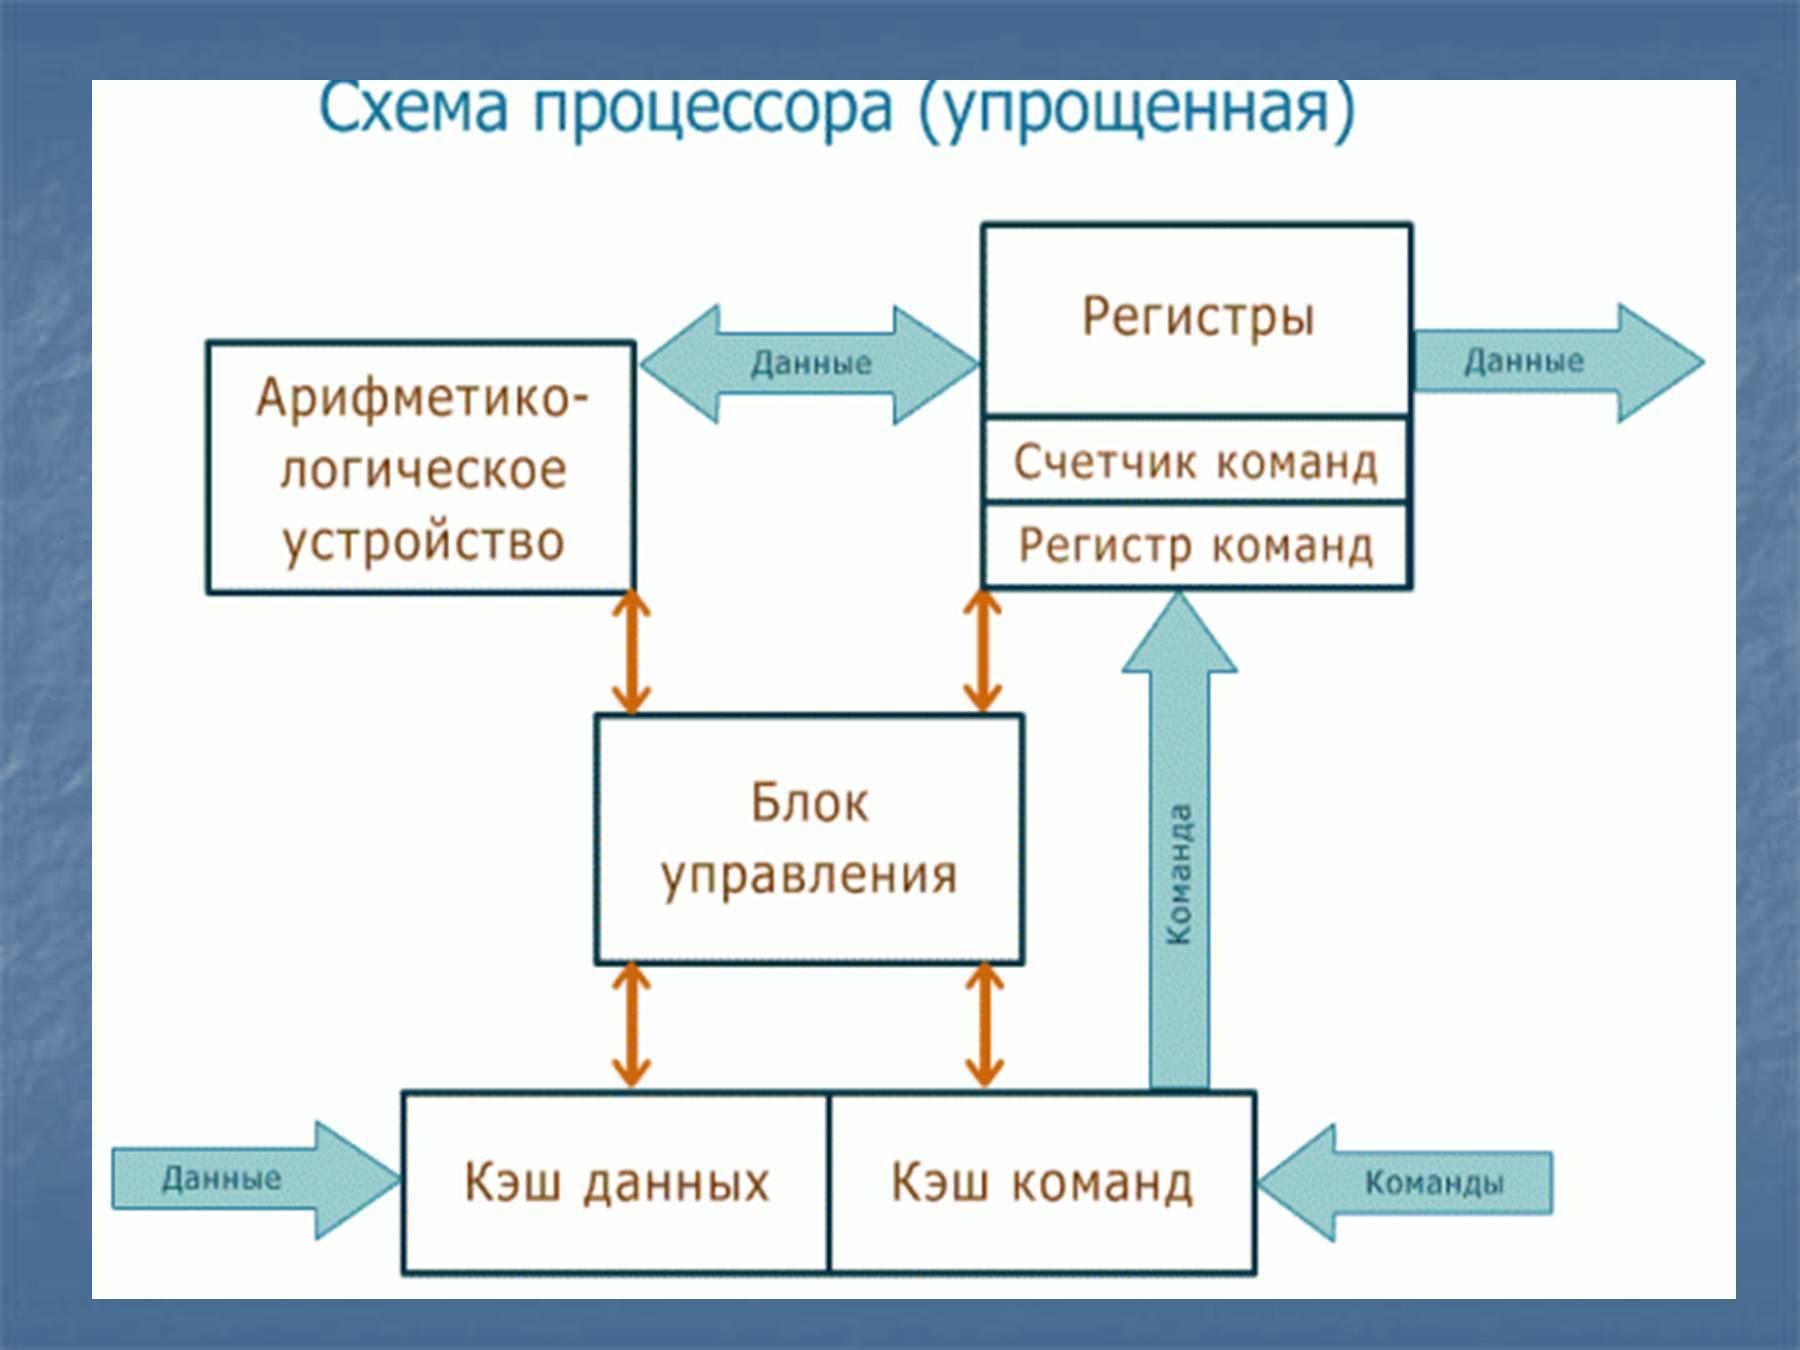 Анализ структуры программы по схеме